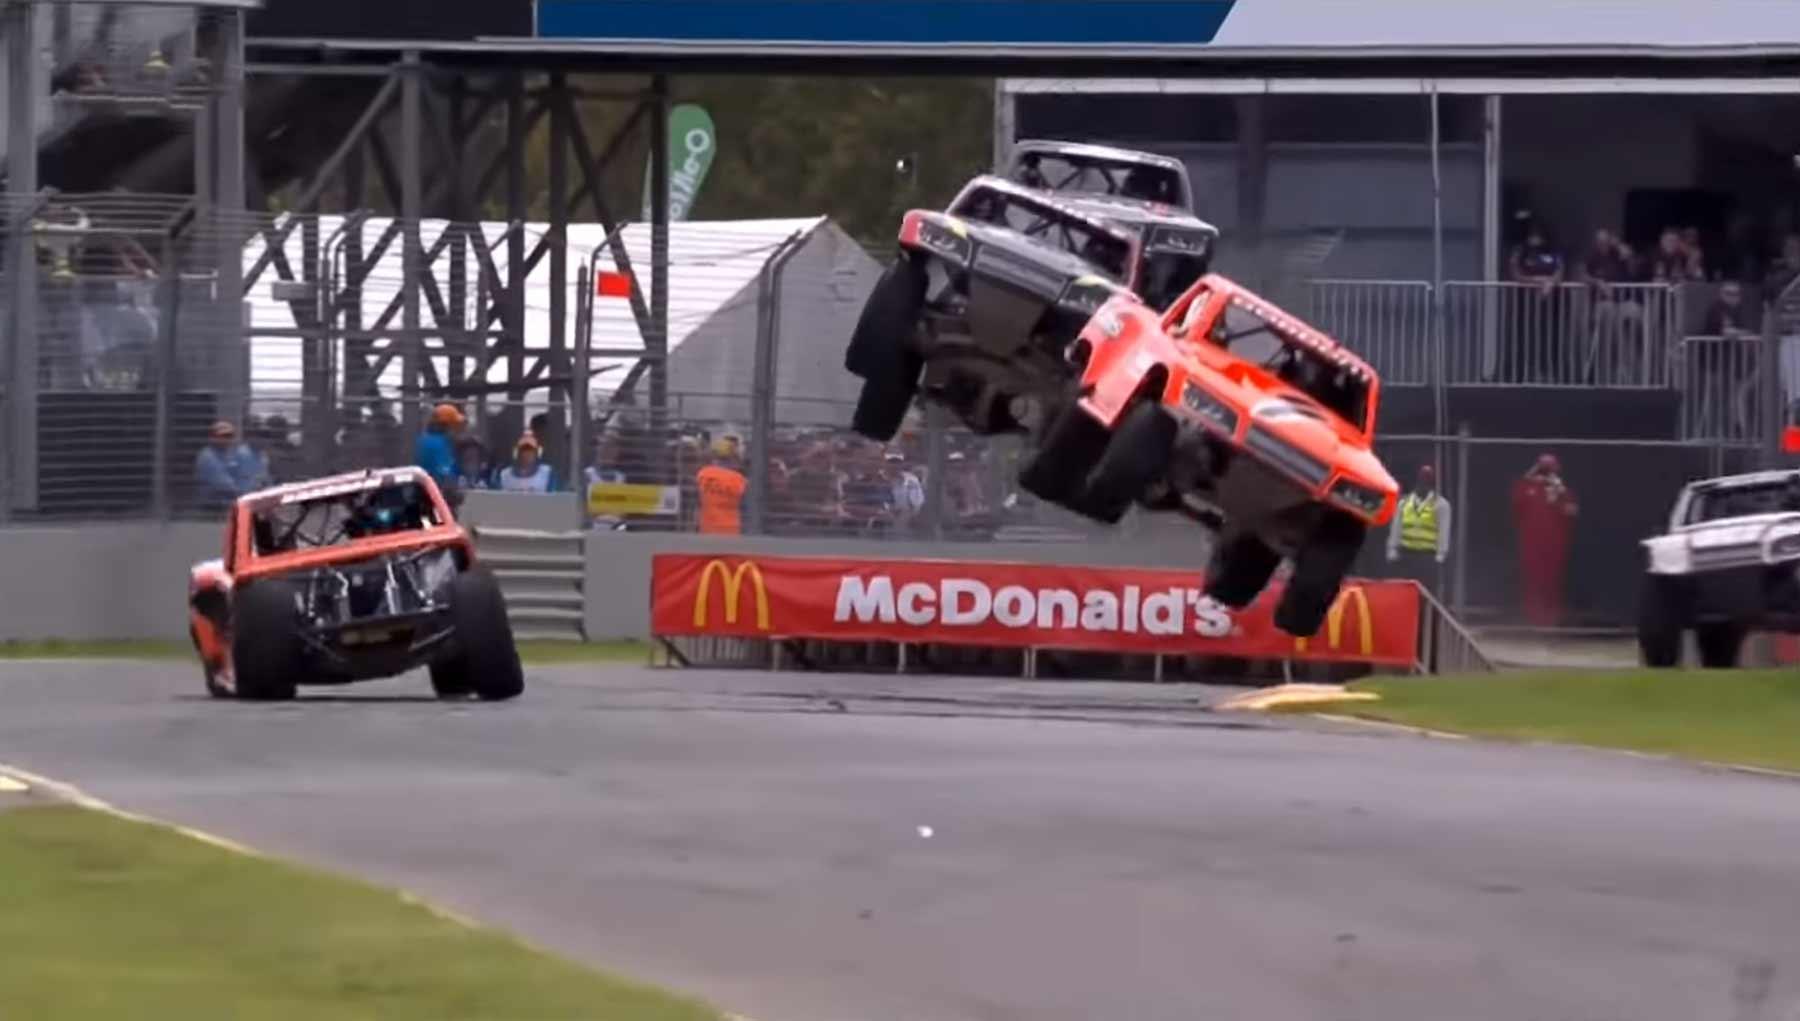 Radikales Rampen-Rennen super-trucks-ramps-race